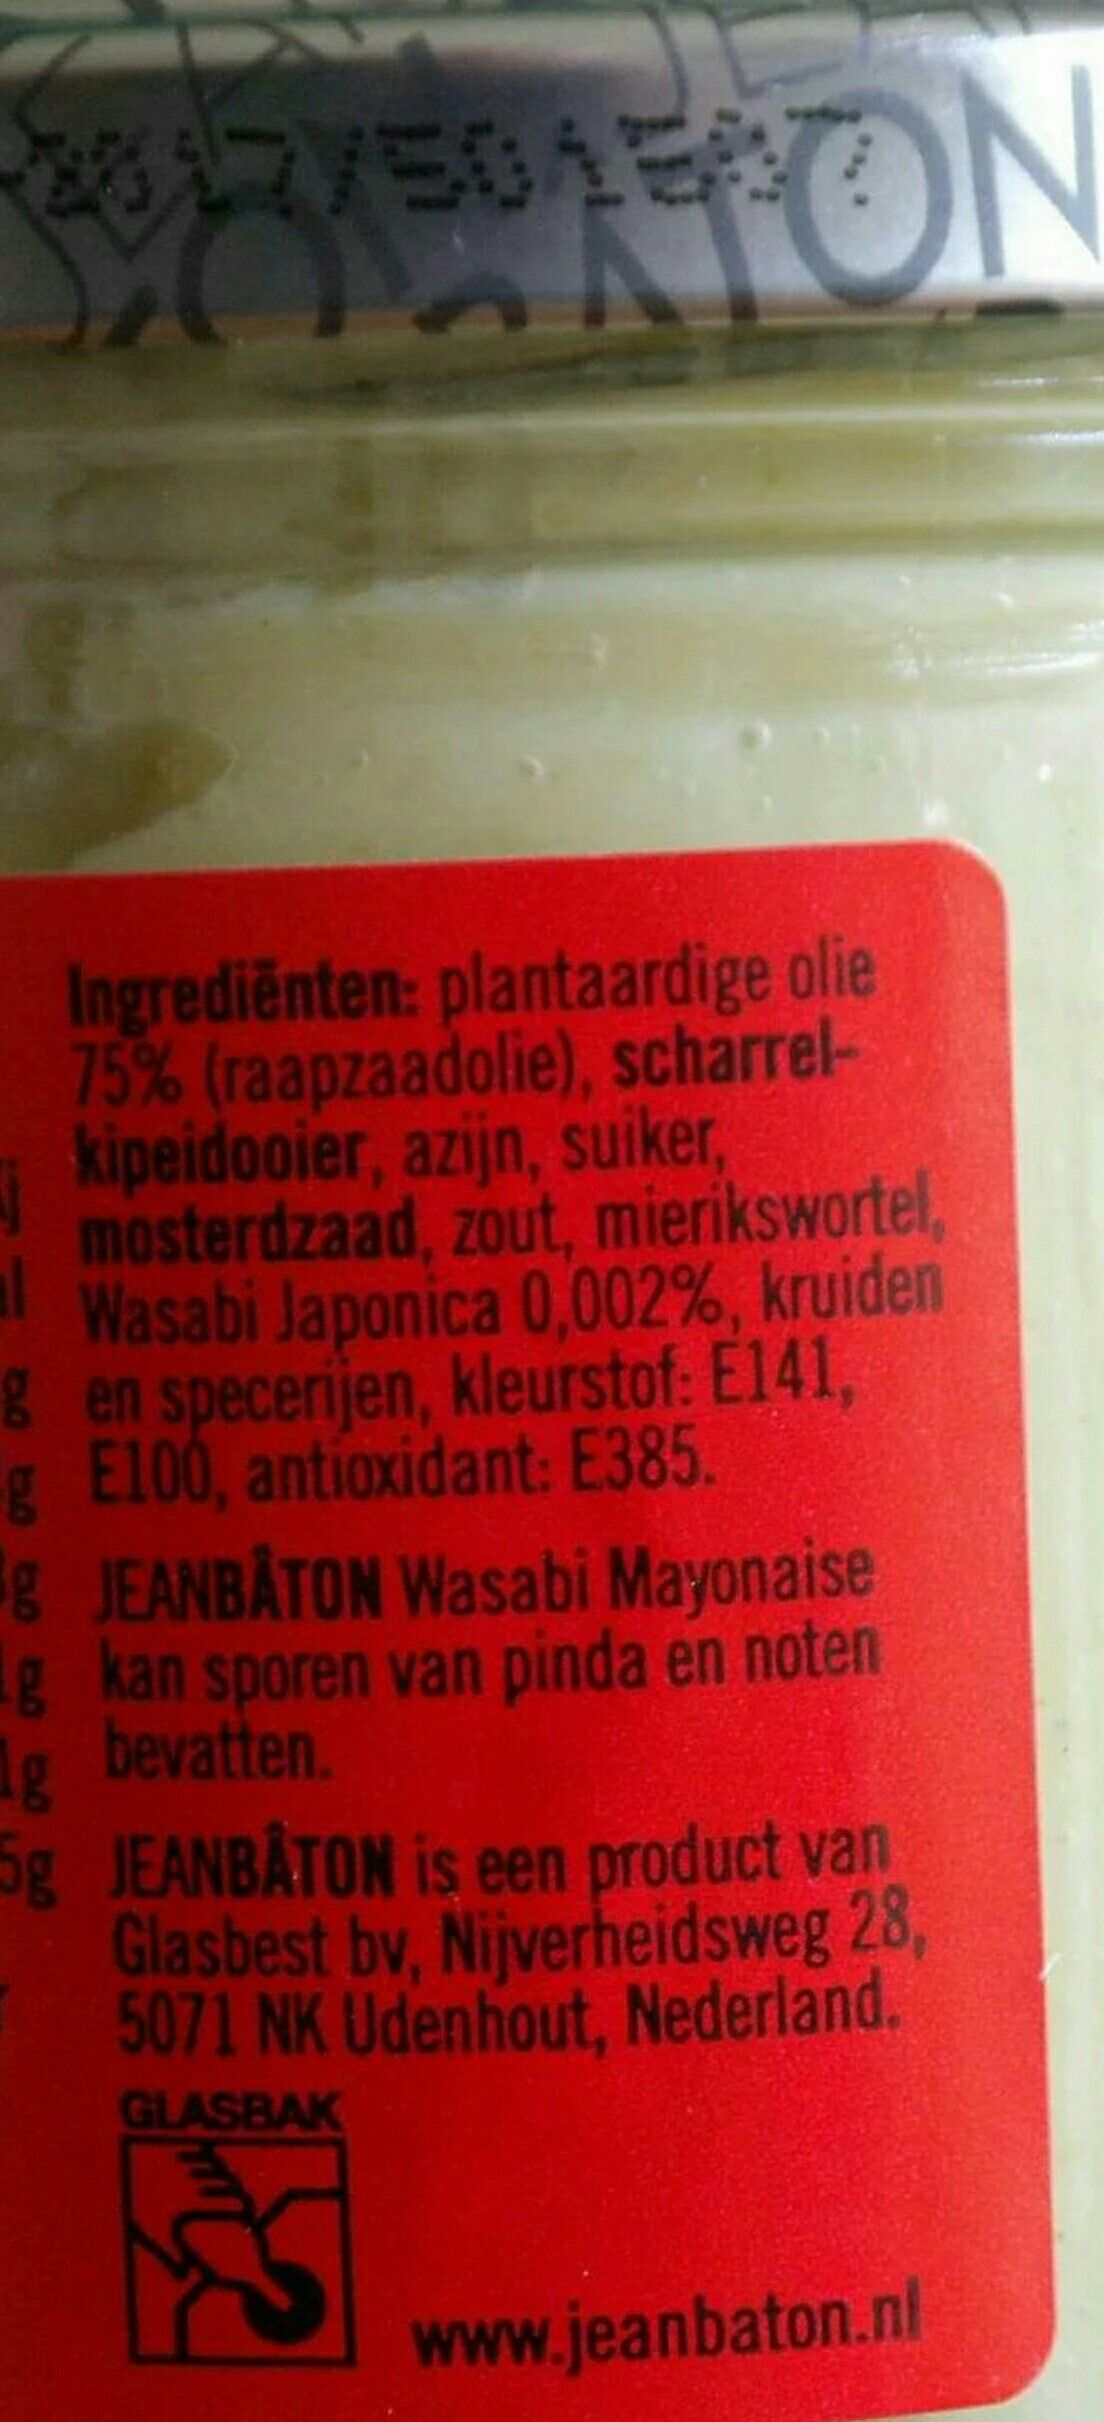 antioxidant e385